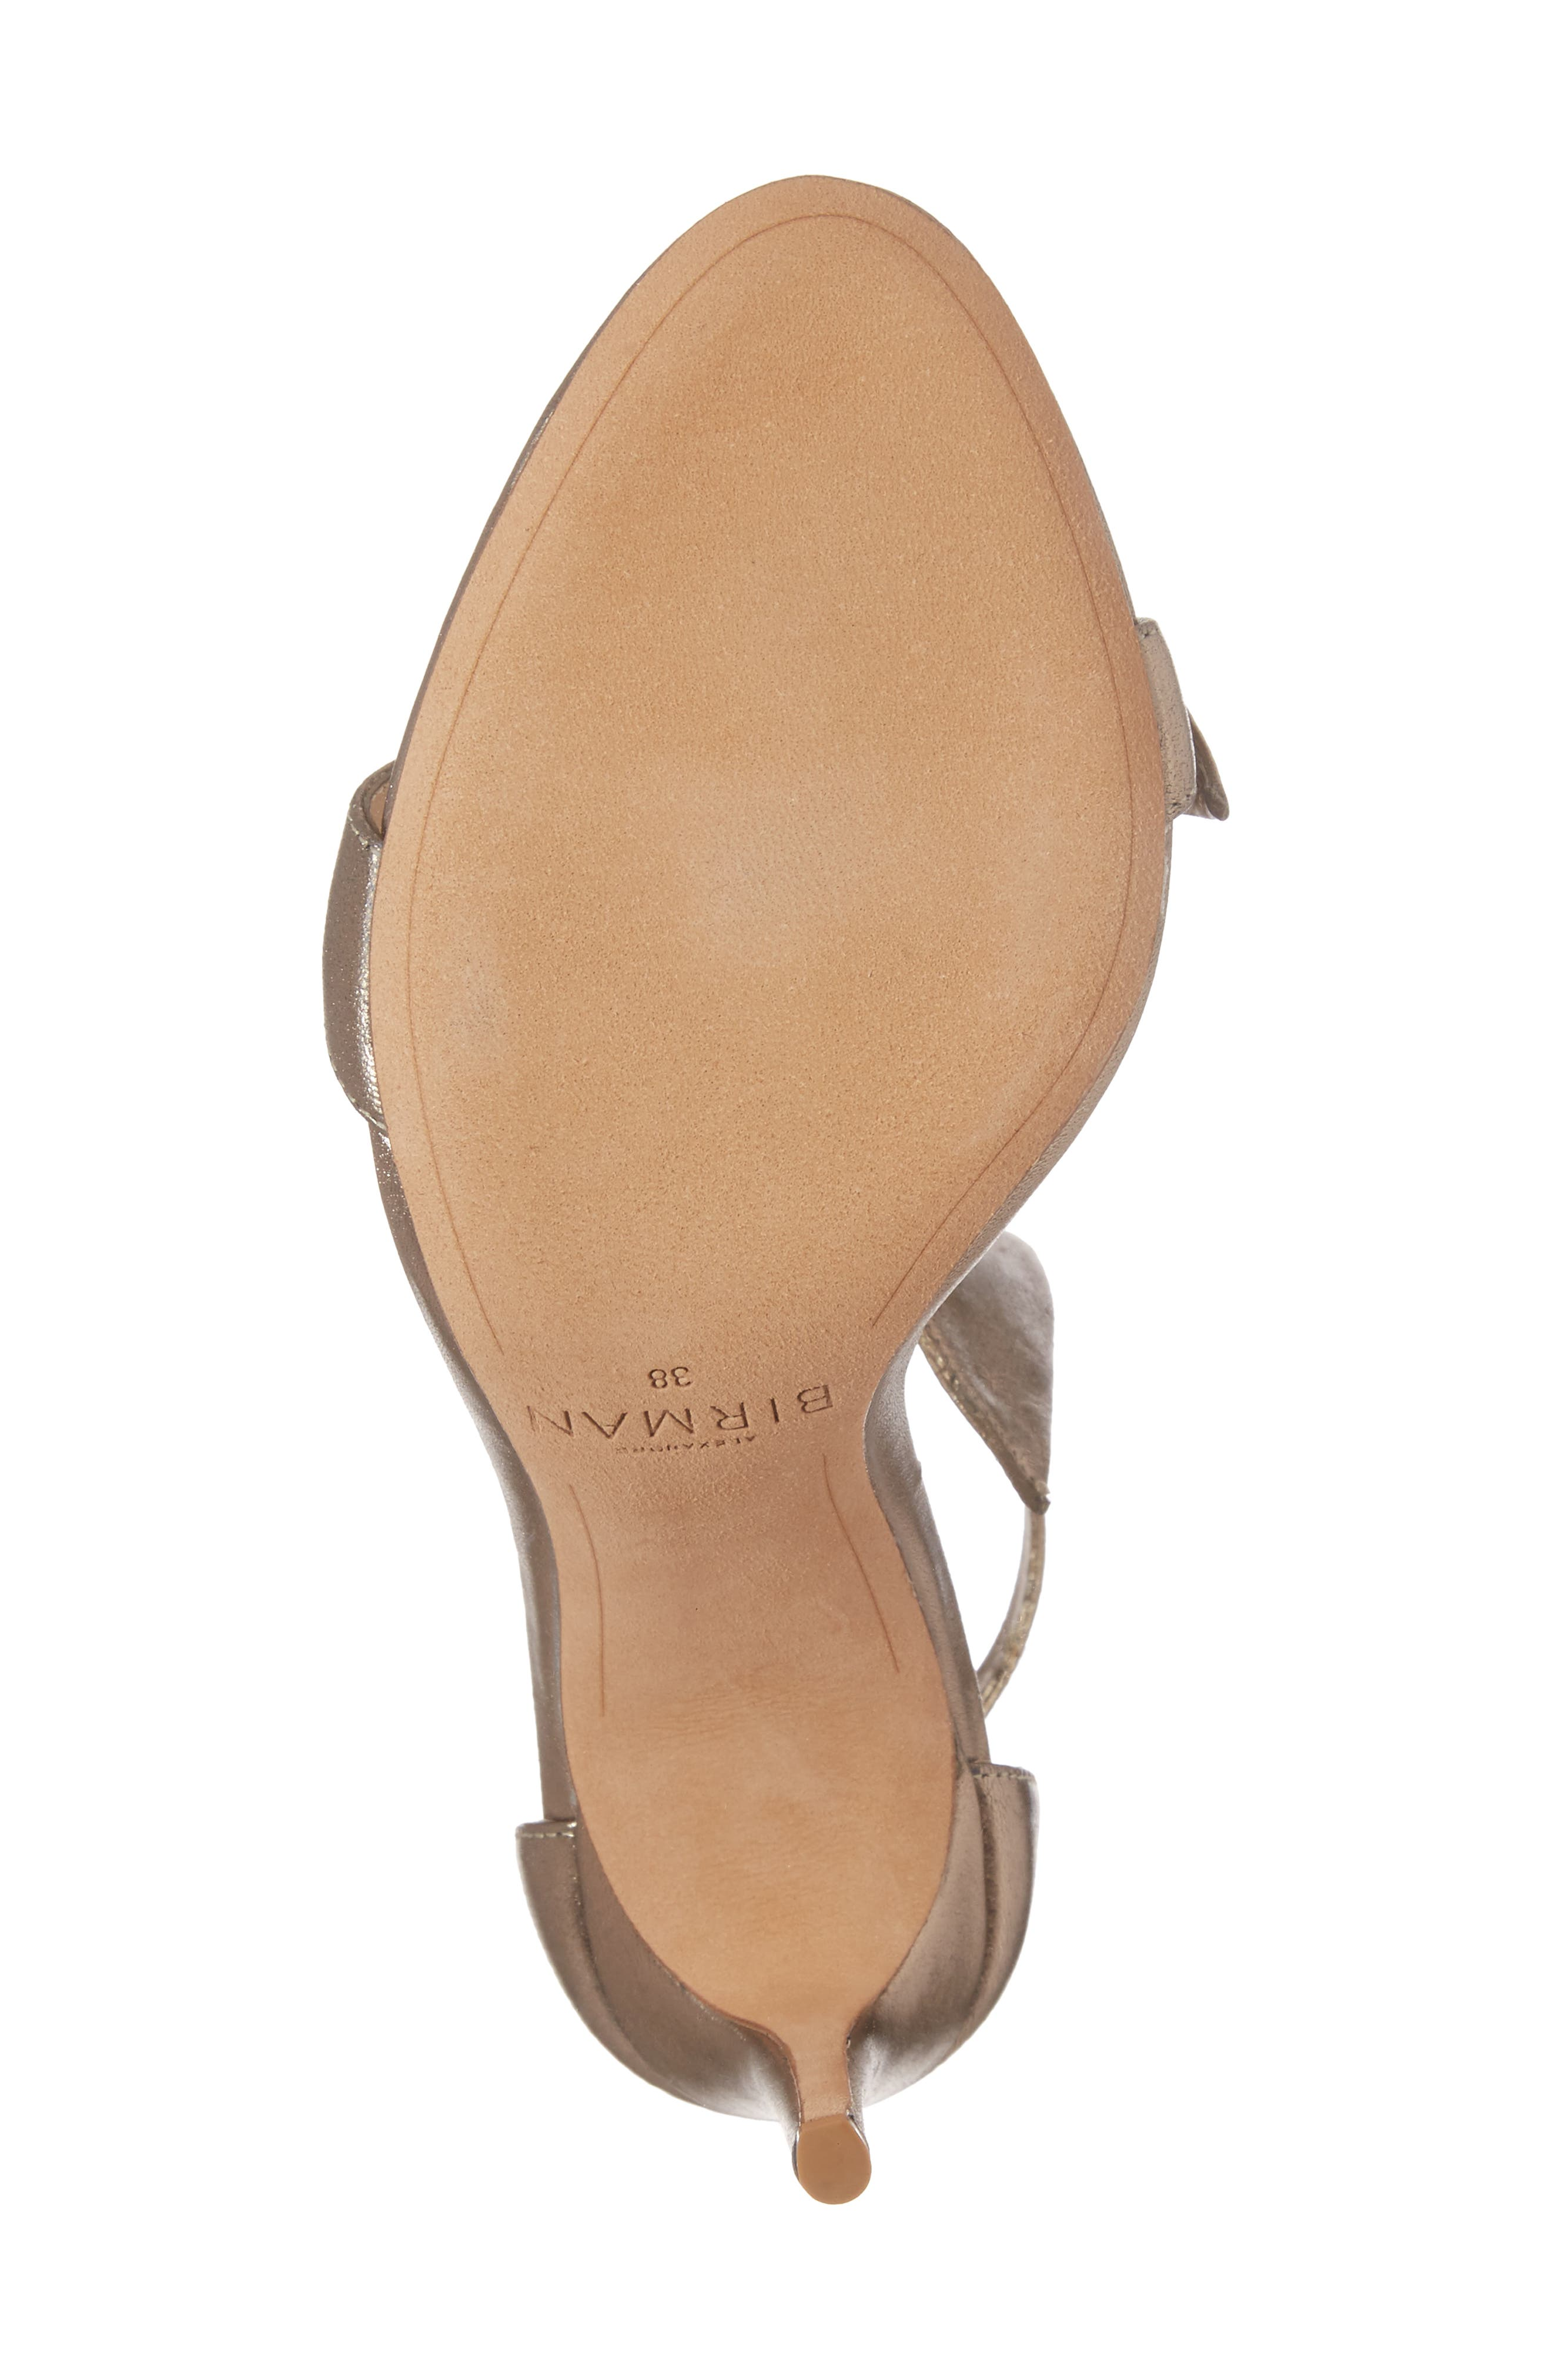 Clarita Ankle Tie Sandal,                             Alternate thumbnail 6, color,                             METALLIC GOLD LEATHER